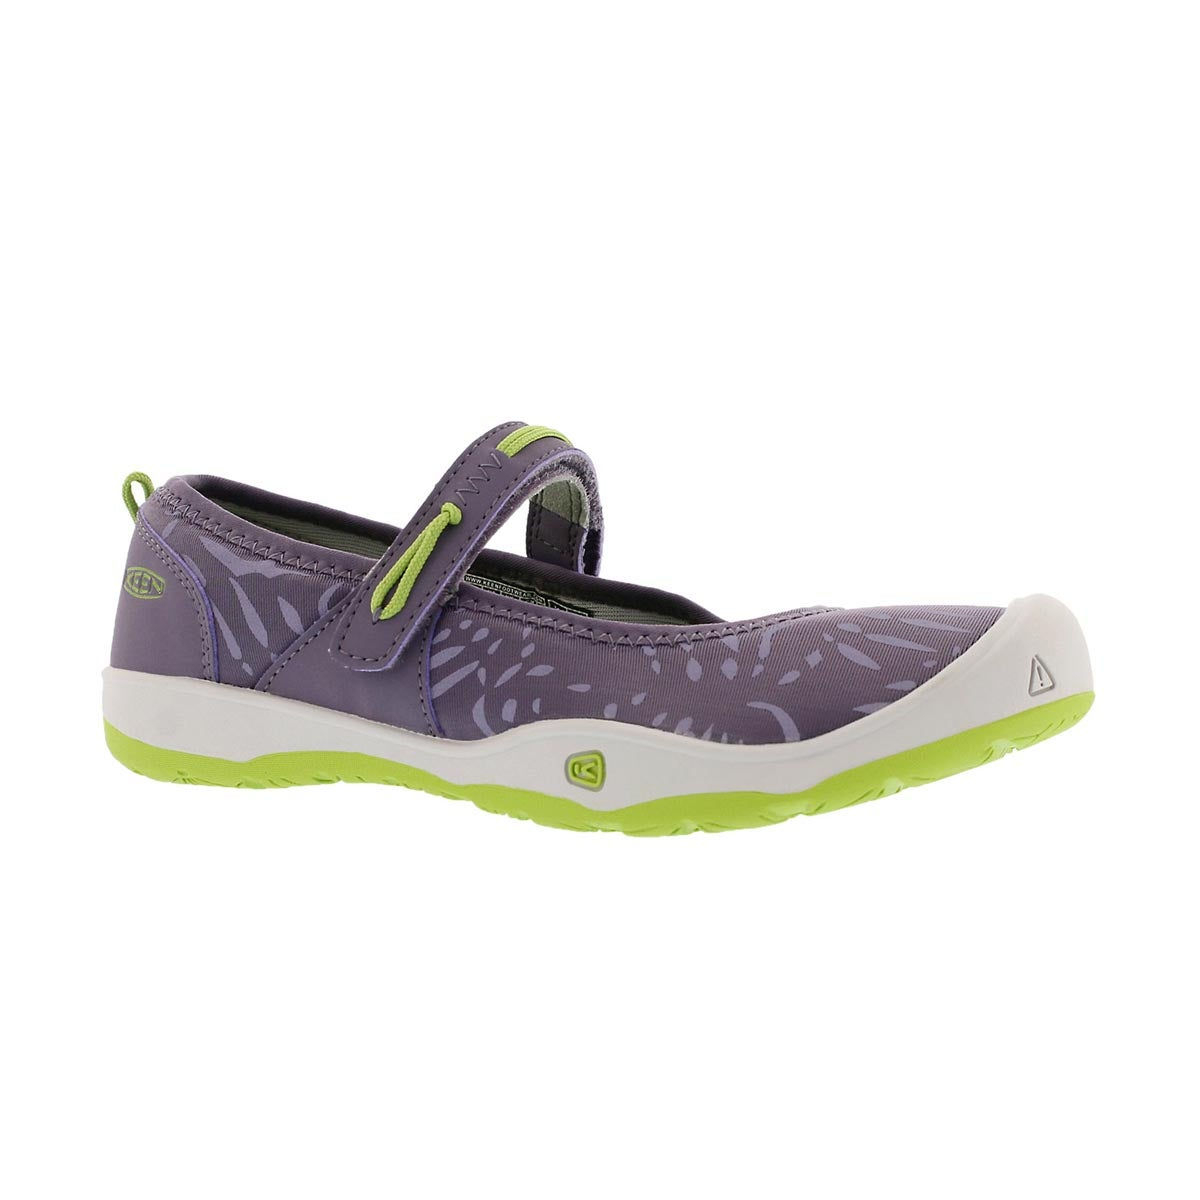 Grls Moxie purple/green casual mary jane